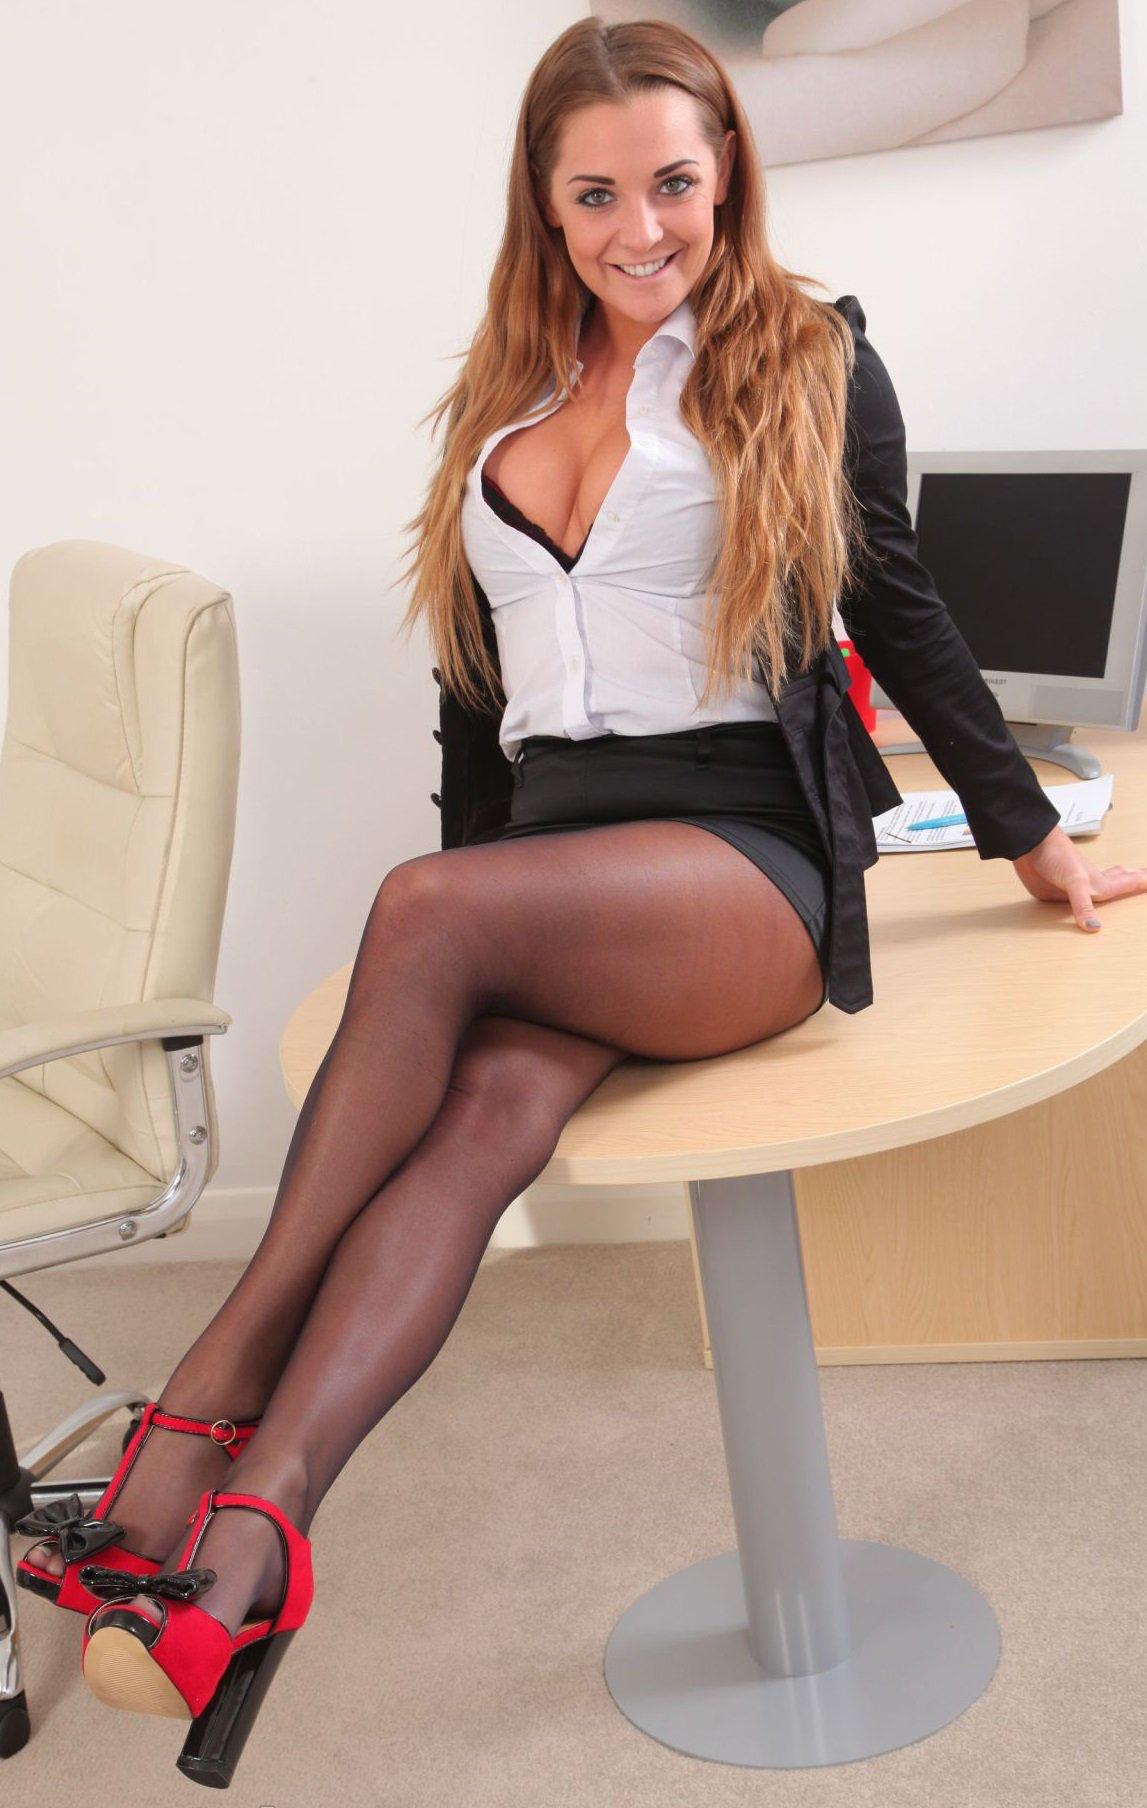 Teacher Office Stockings Legs The Offices Secretary Dating Ph Qoutes Desks